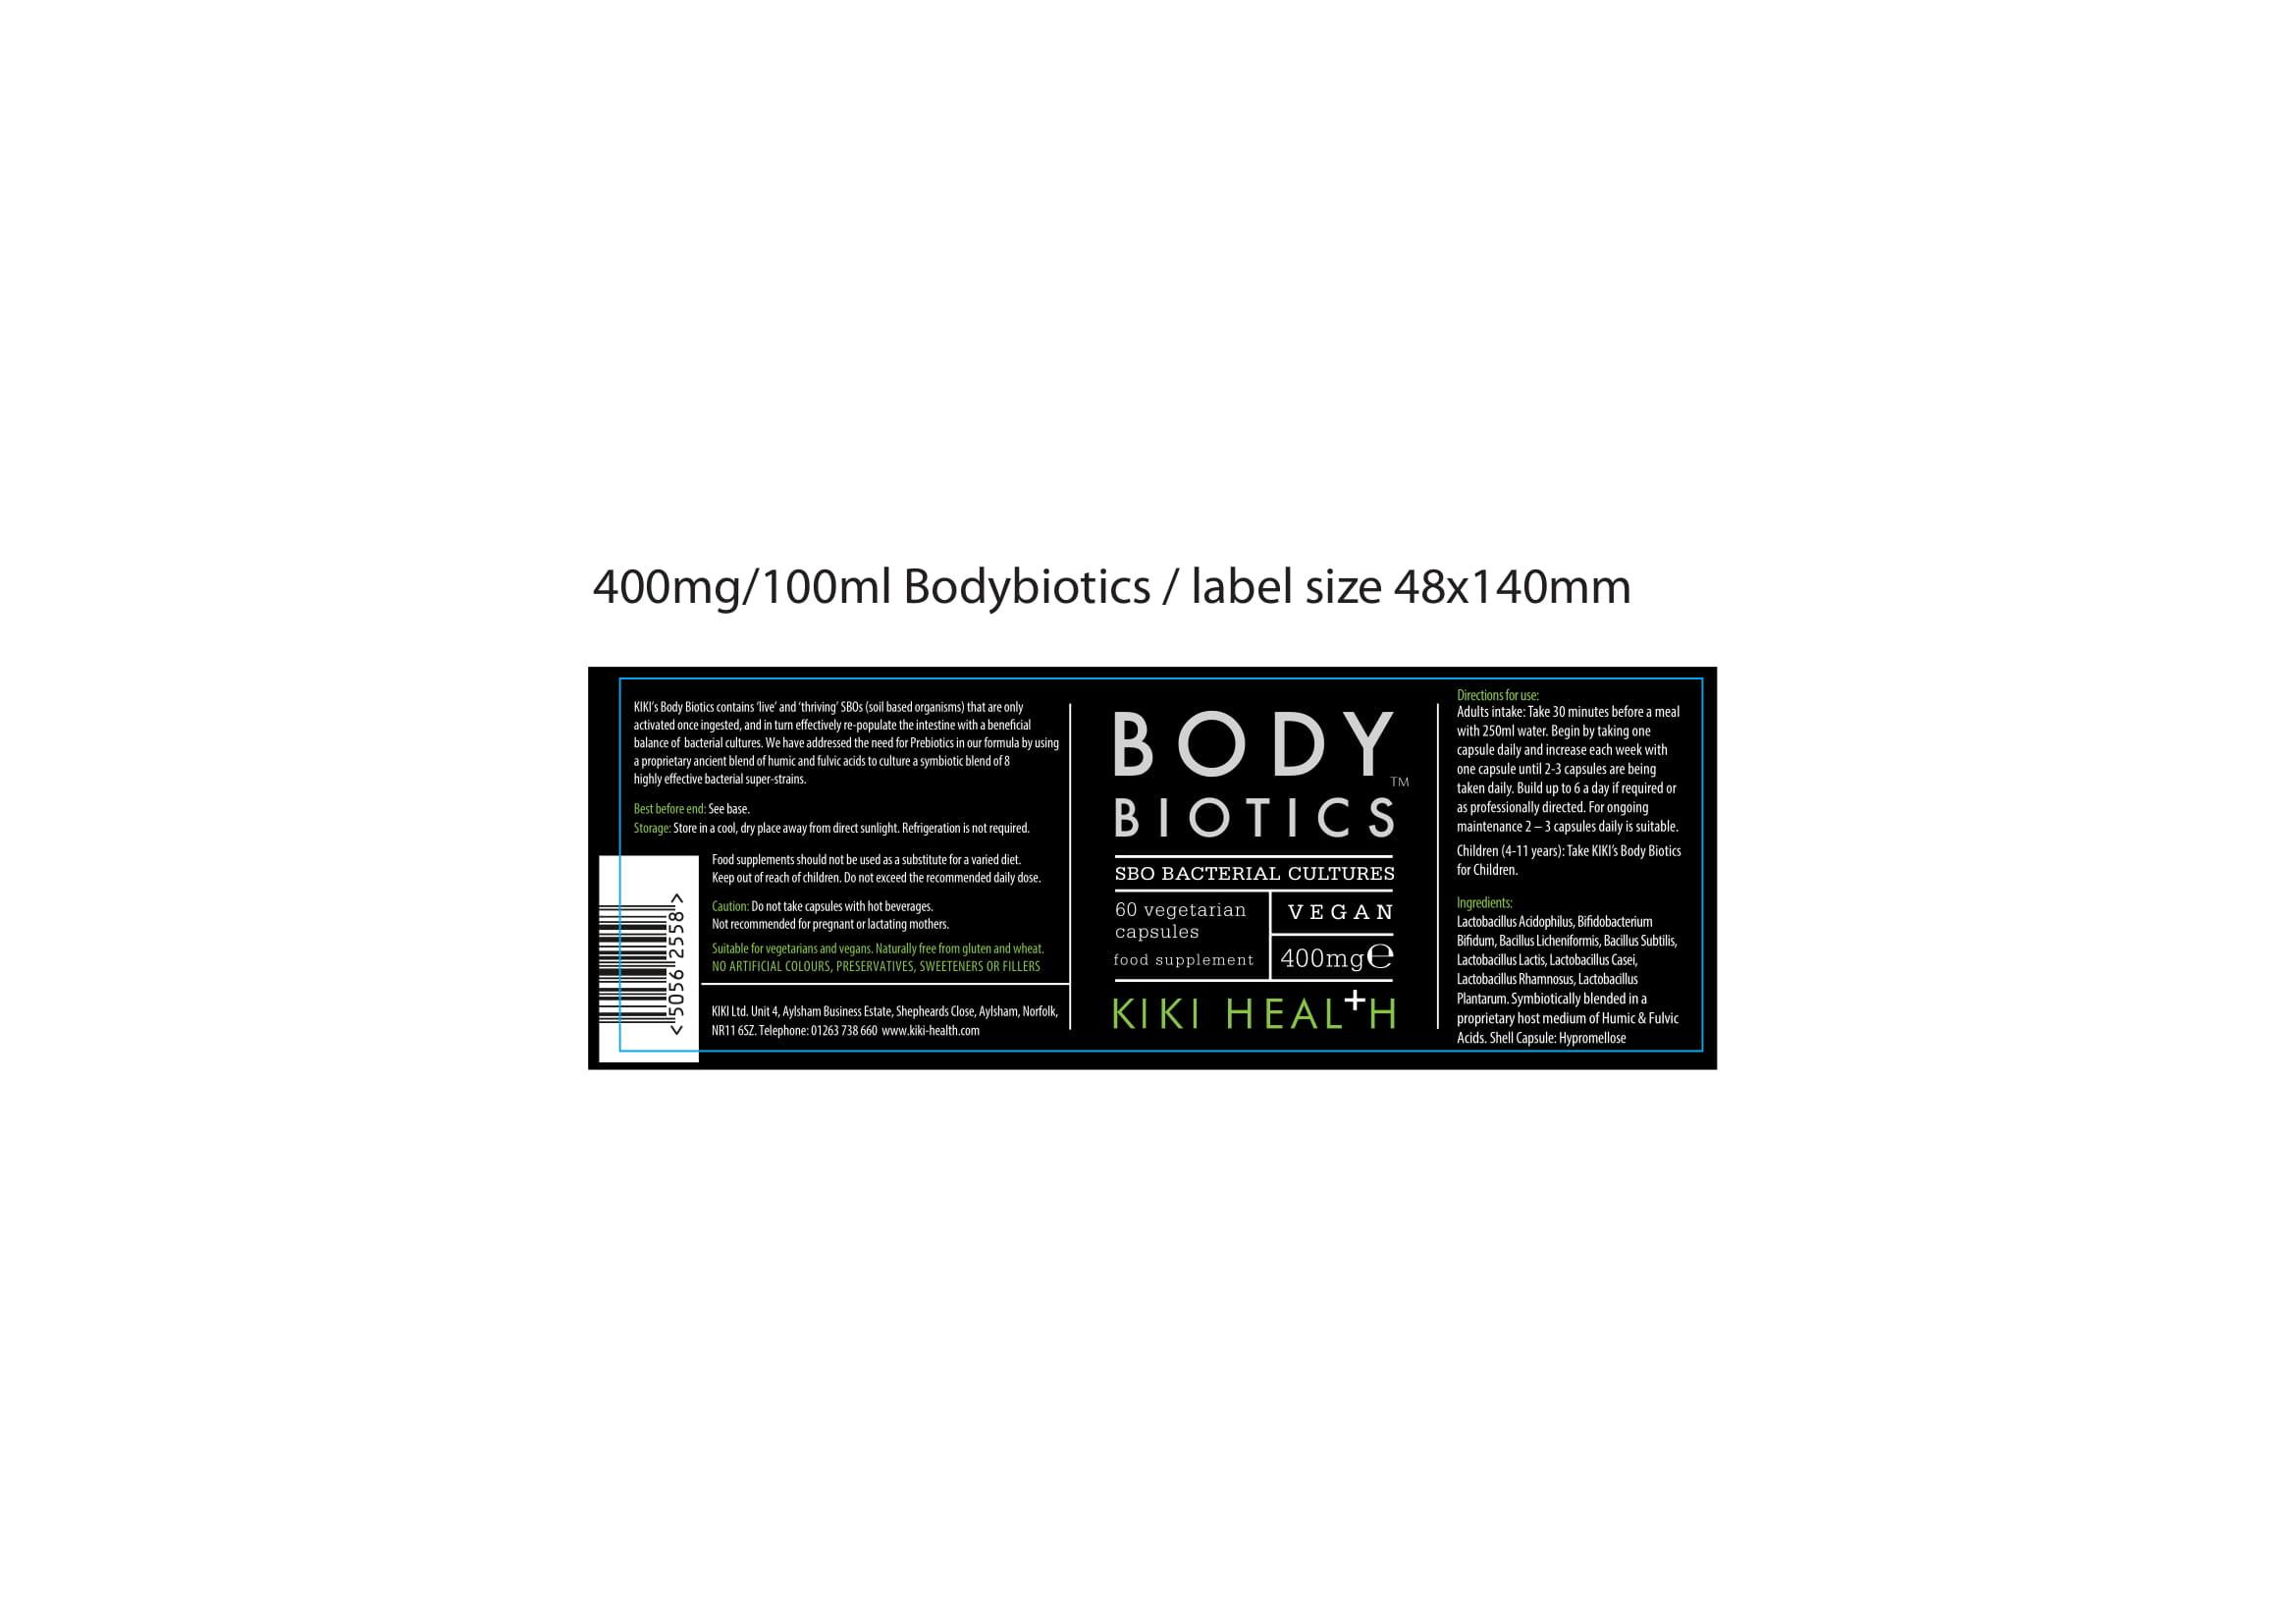 Body Biotics 400mg 60 S The Natural Dispensary